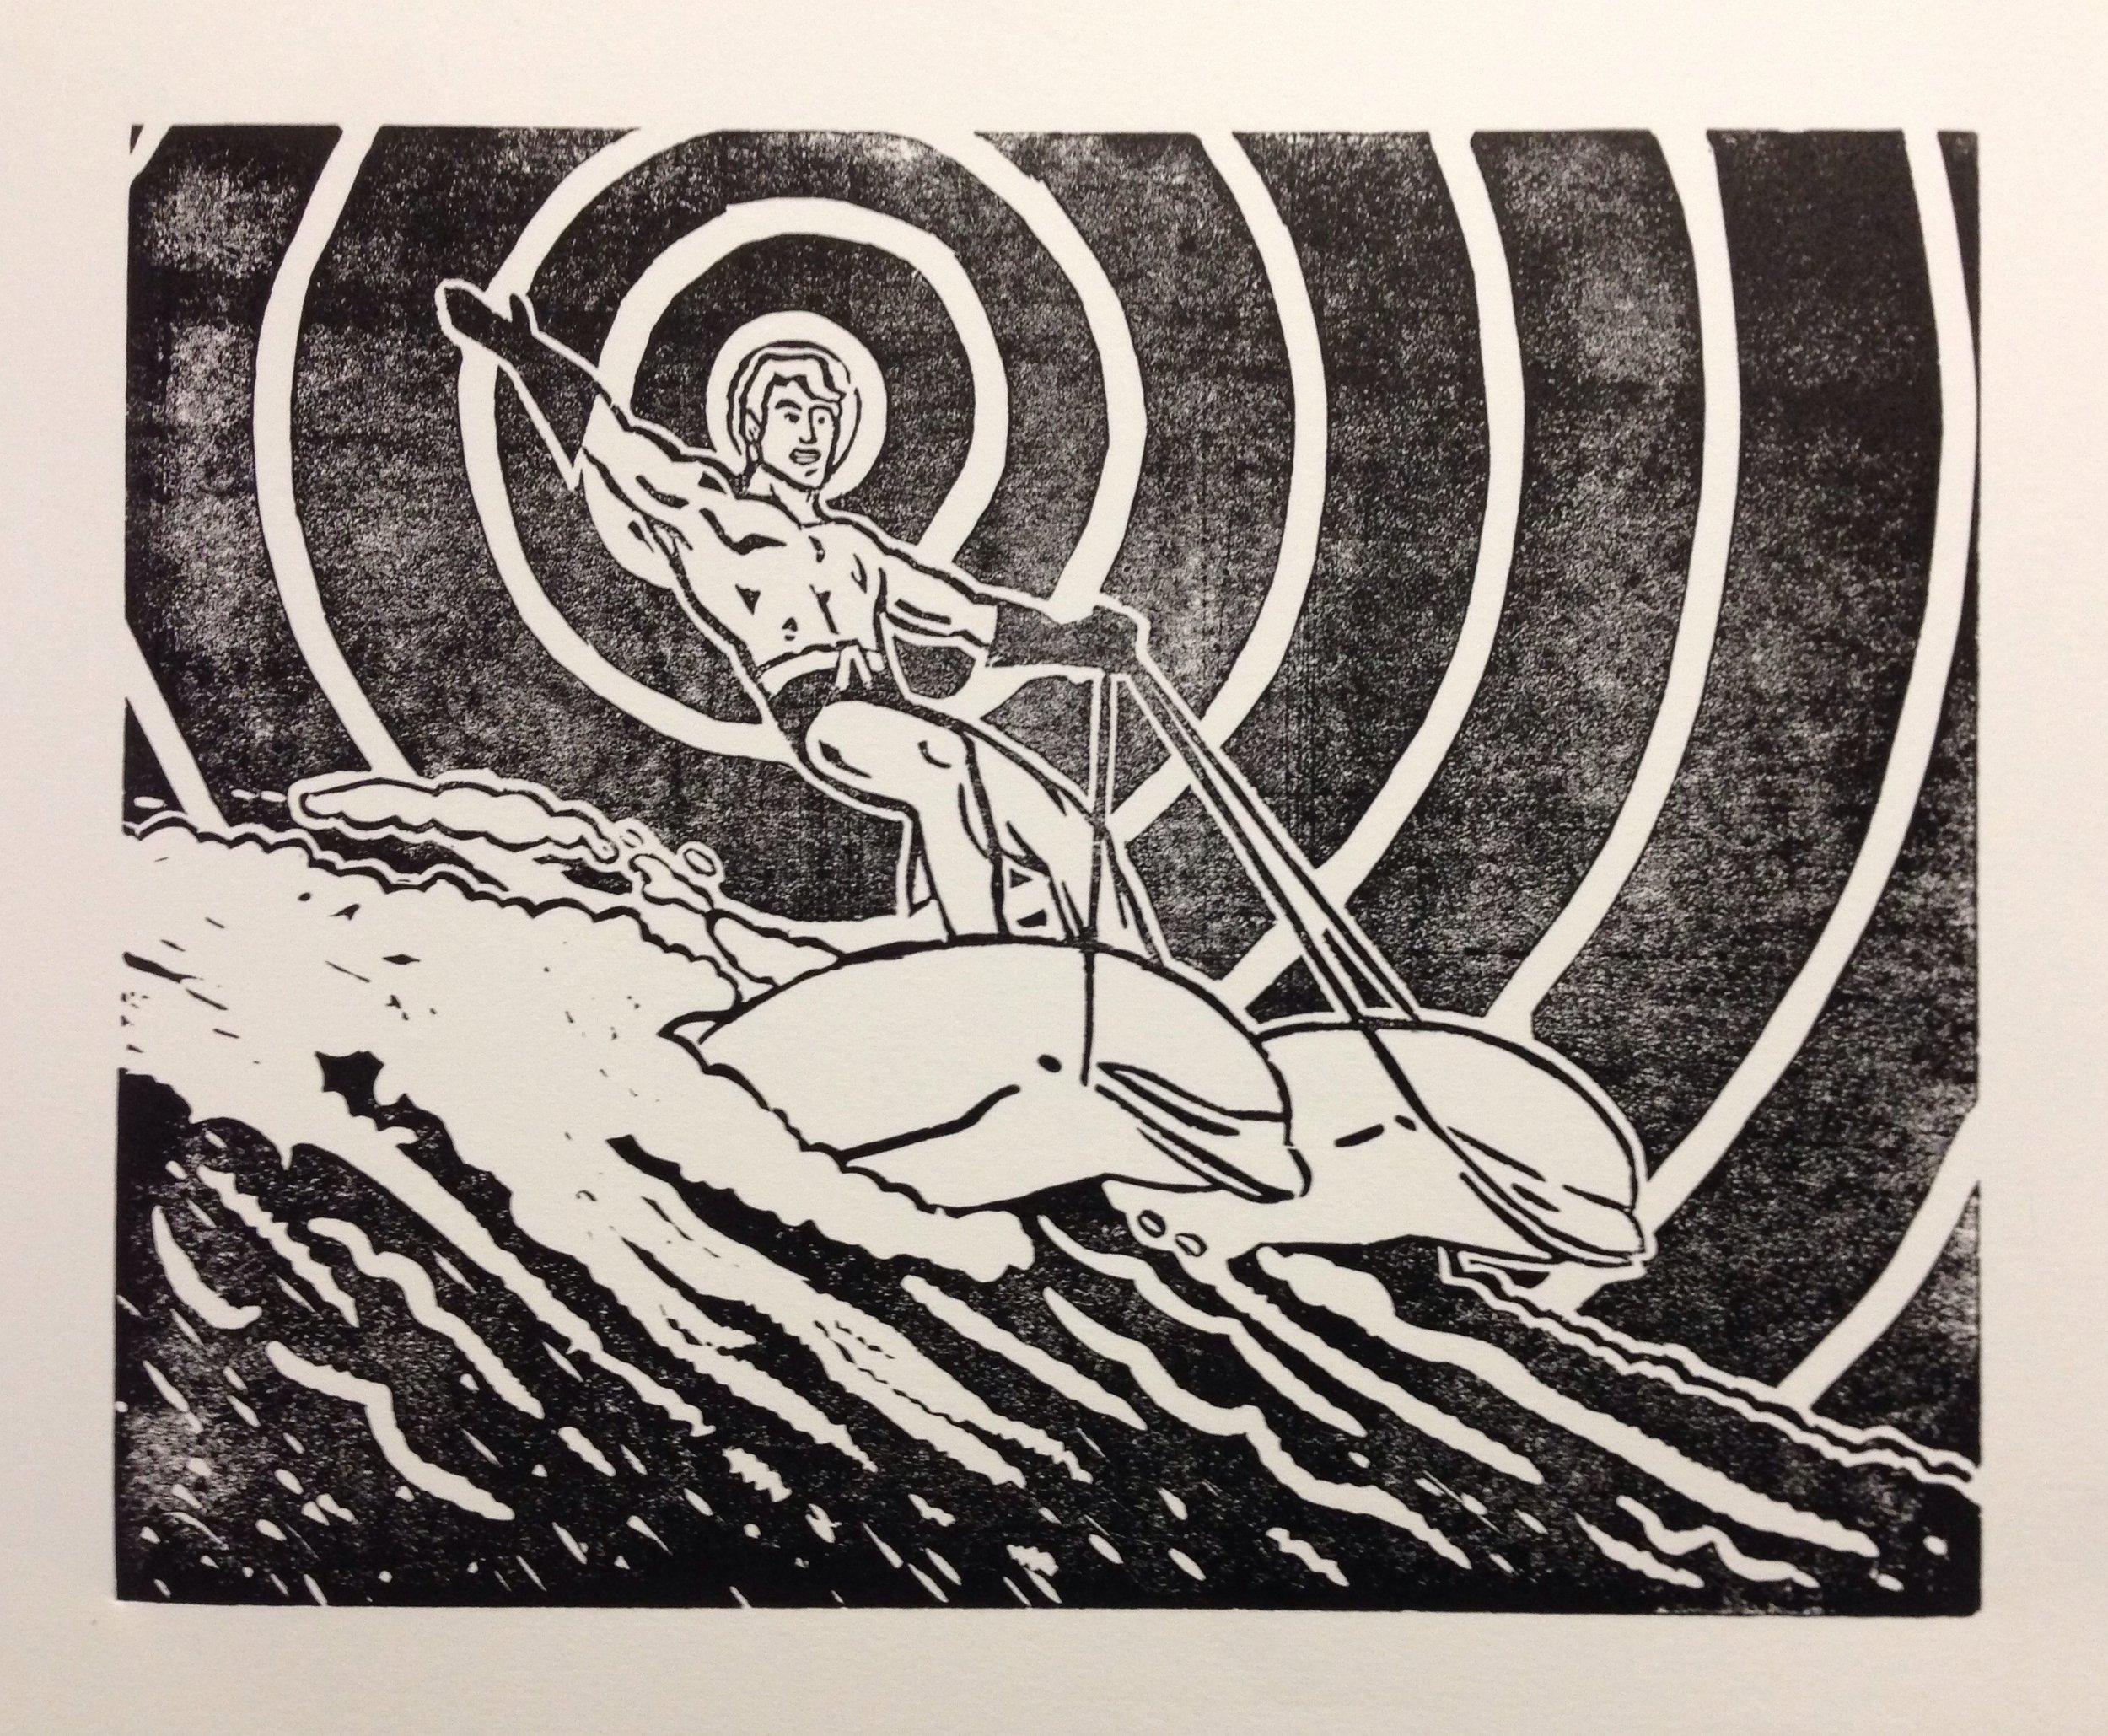 Aquaman, Linocut